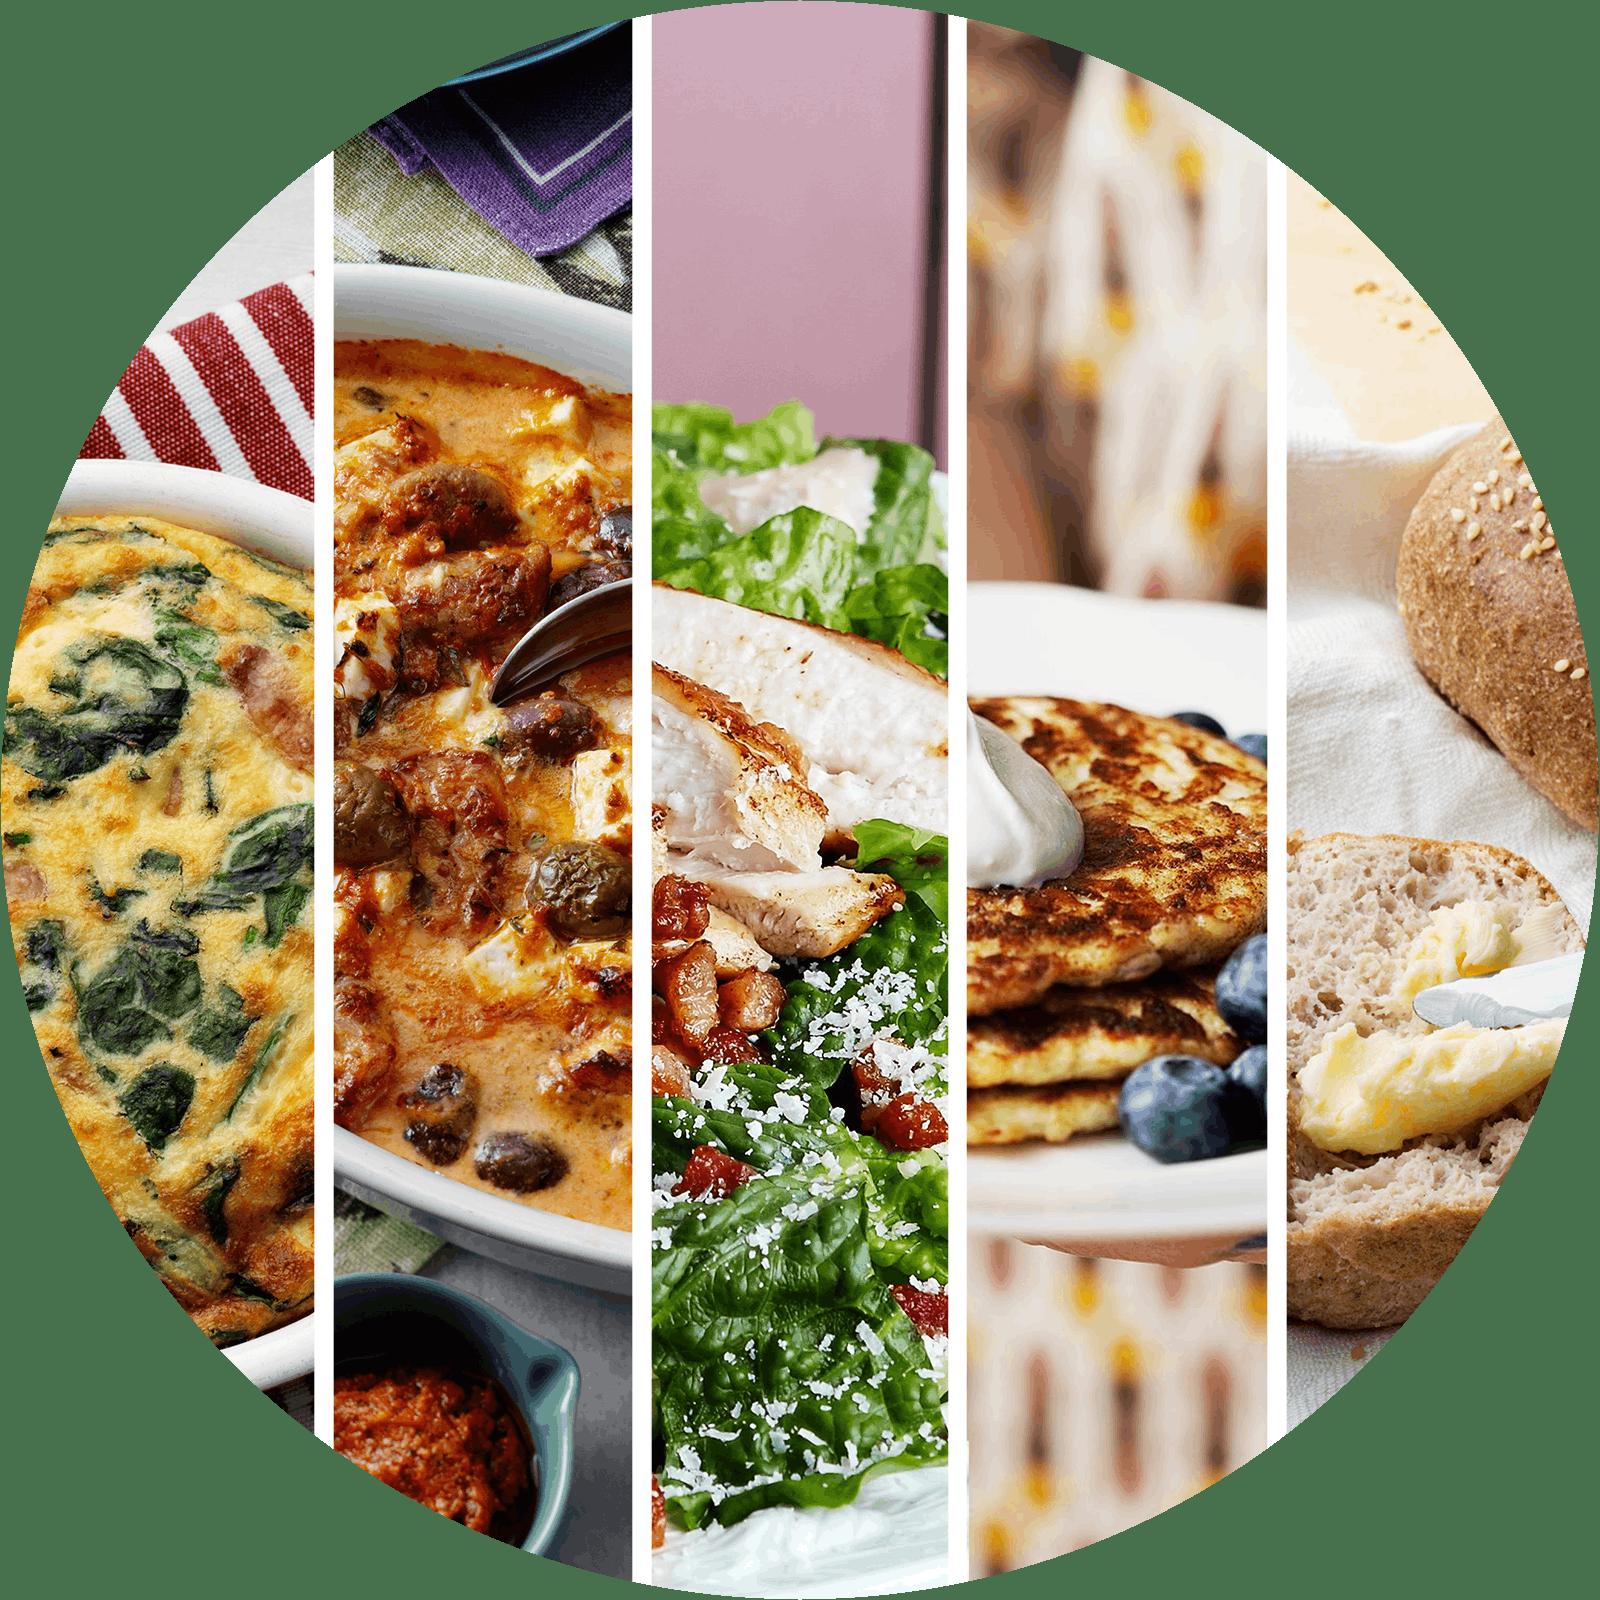 Low-carb recipe favorites